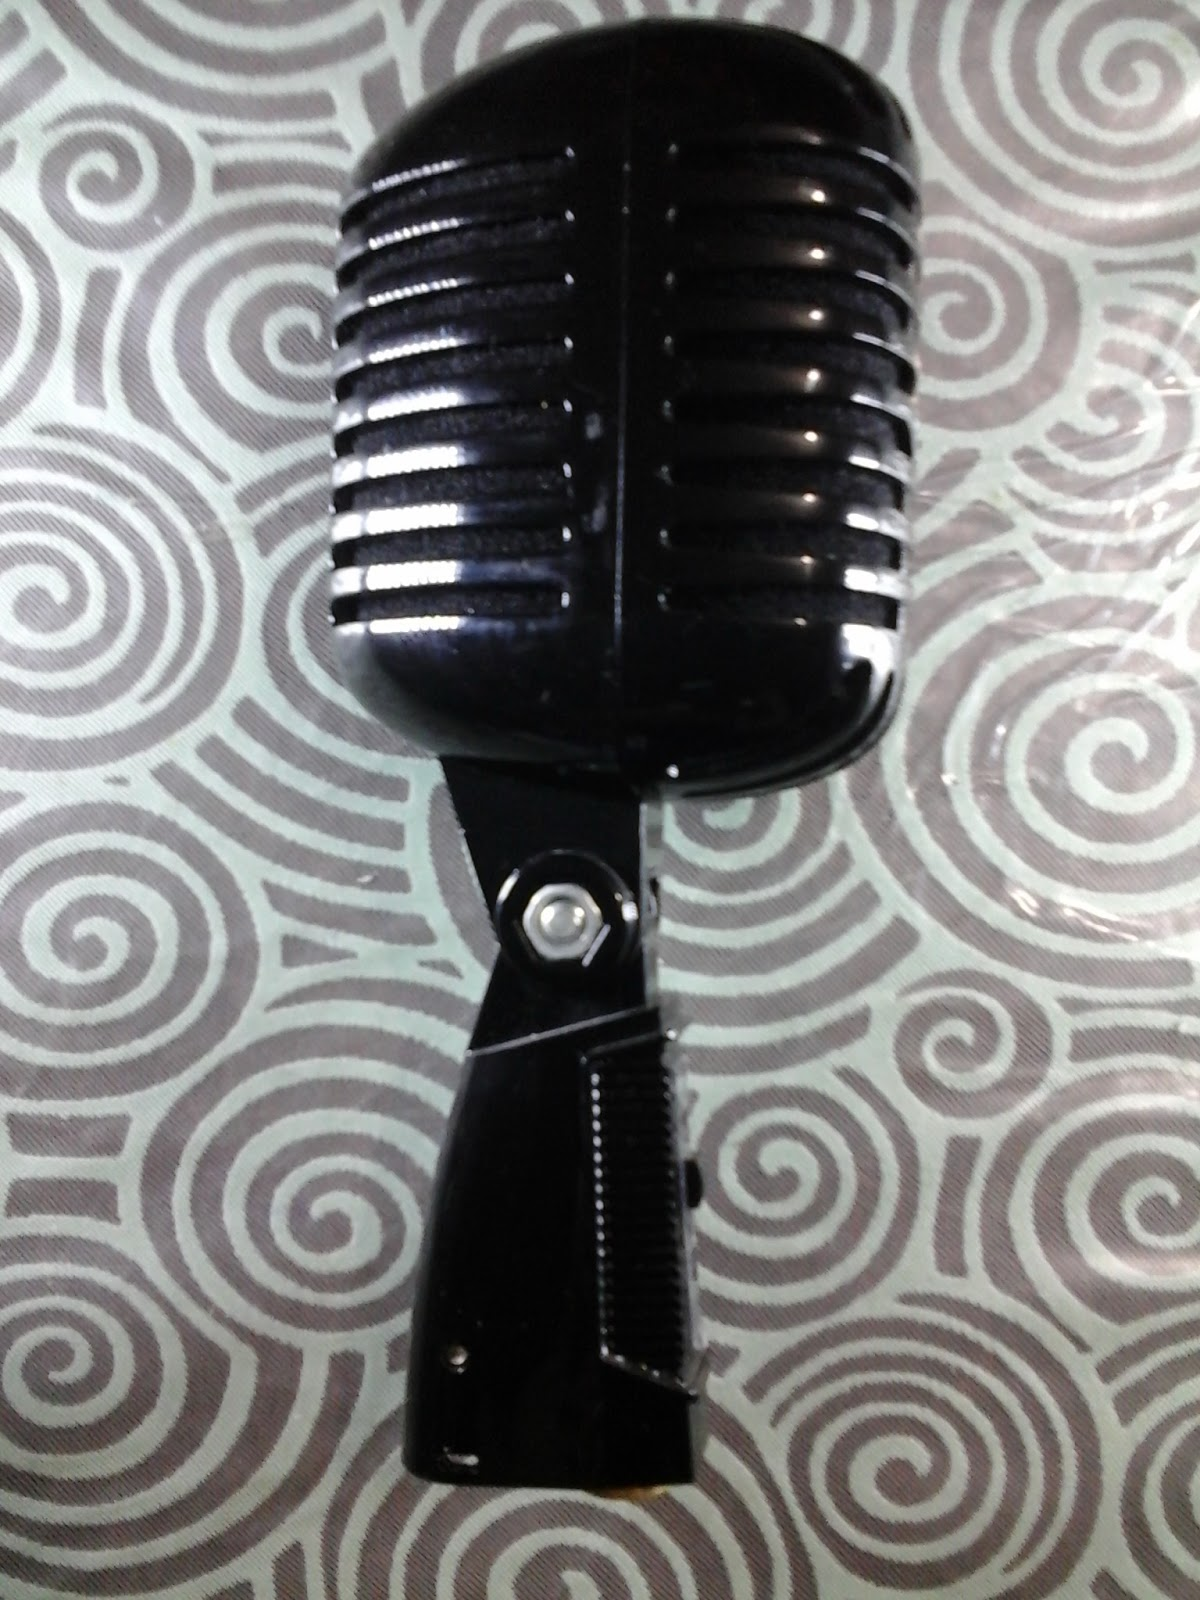 Hawila Multimedi sewa mic classic, mic retro harga murah